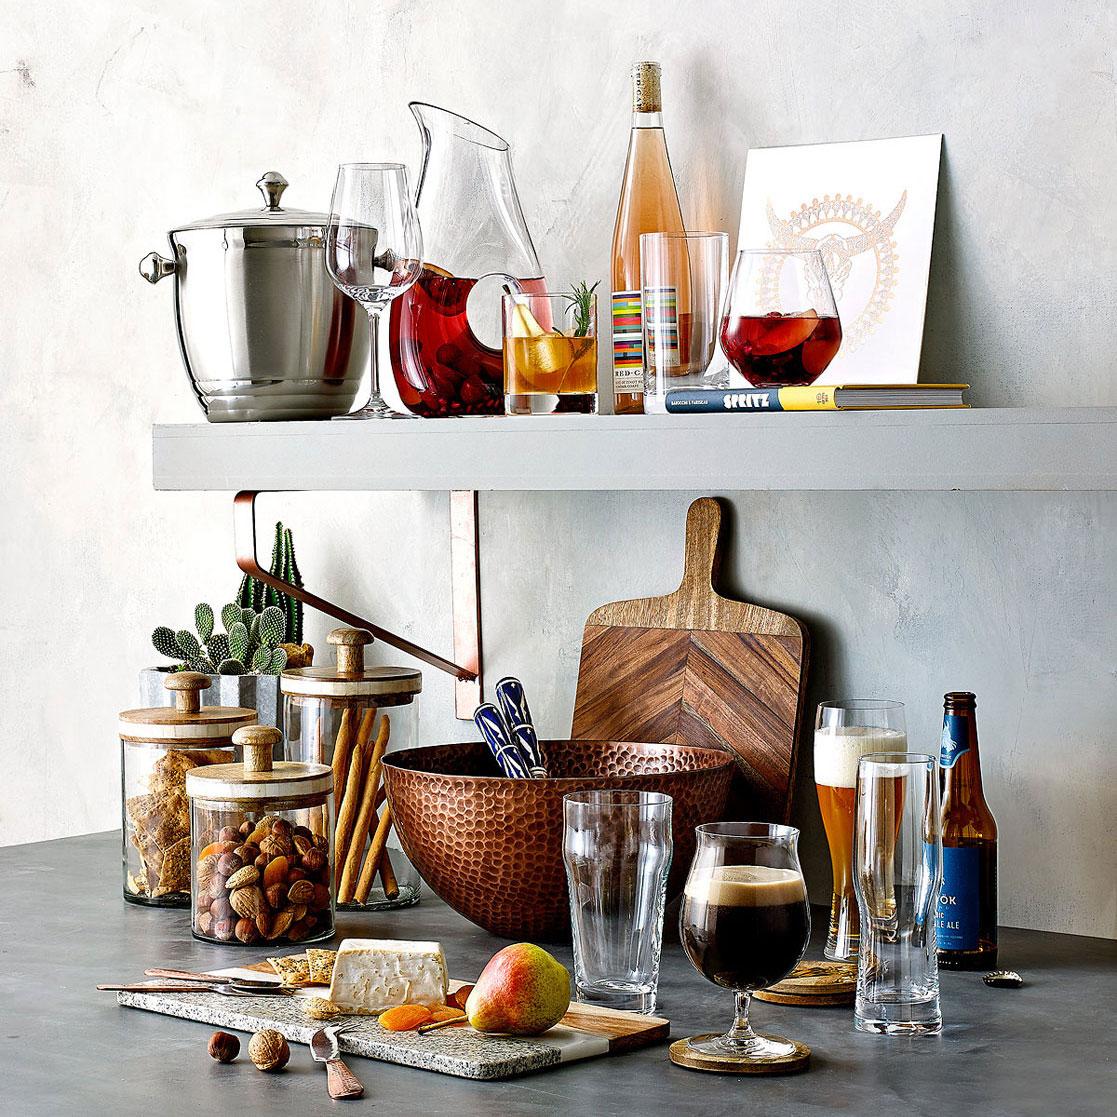 Lenox Tuscany Classics, Pierced Pitcher, Wine Carafe